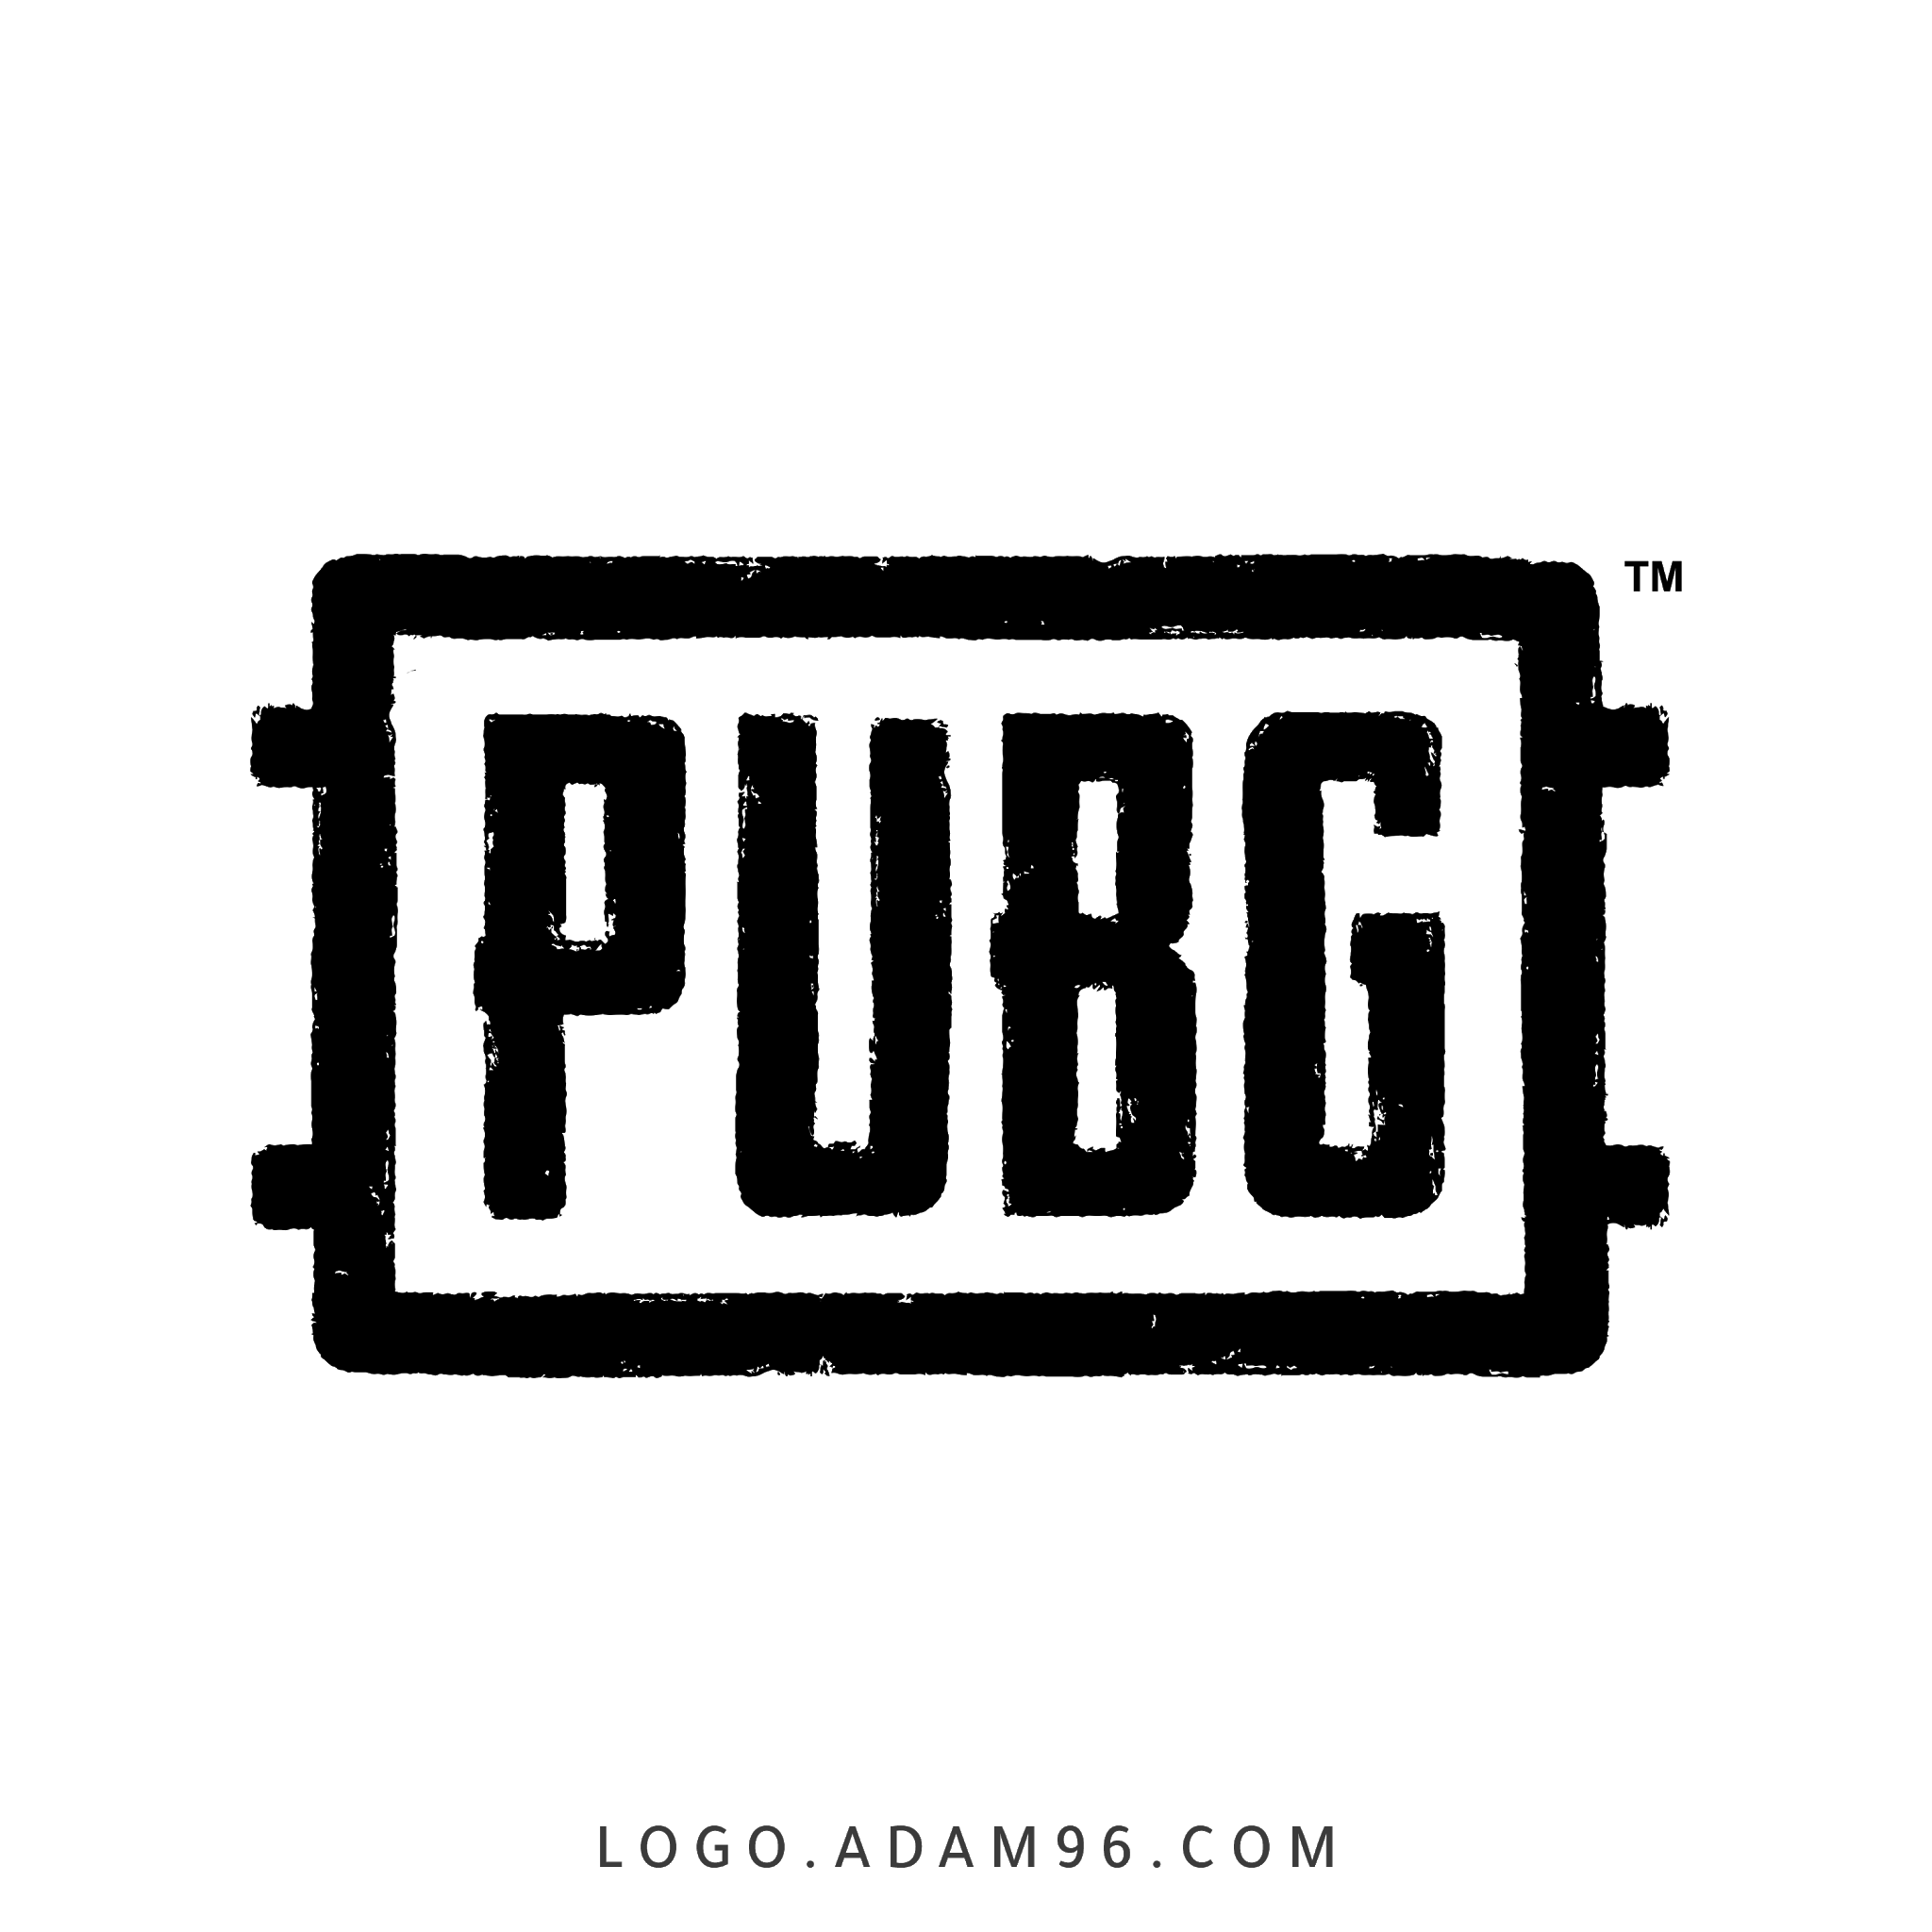 Download PUBG MOBILE Logo High quality official logo